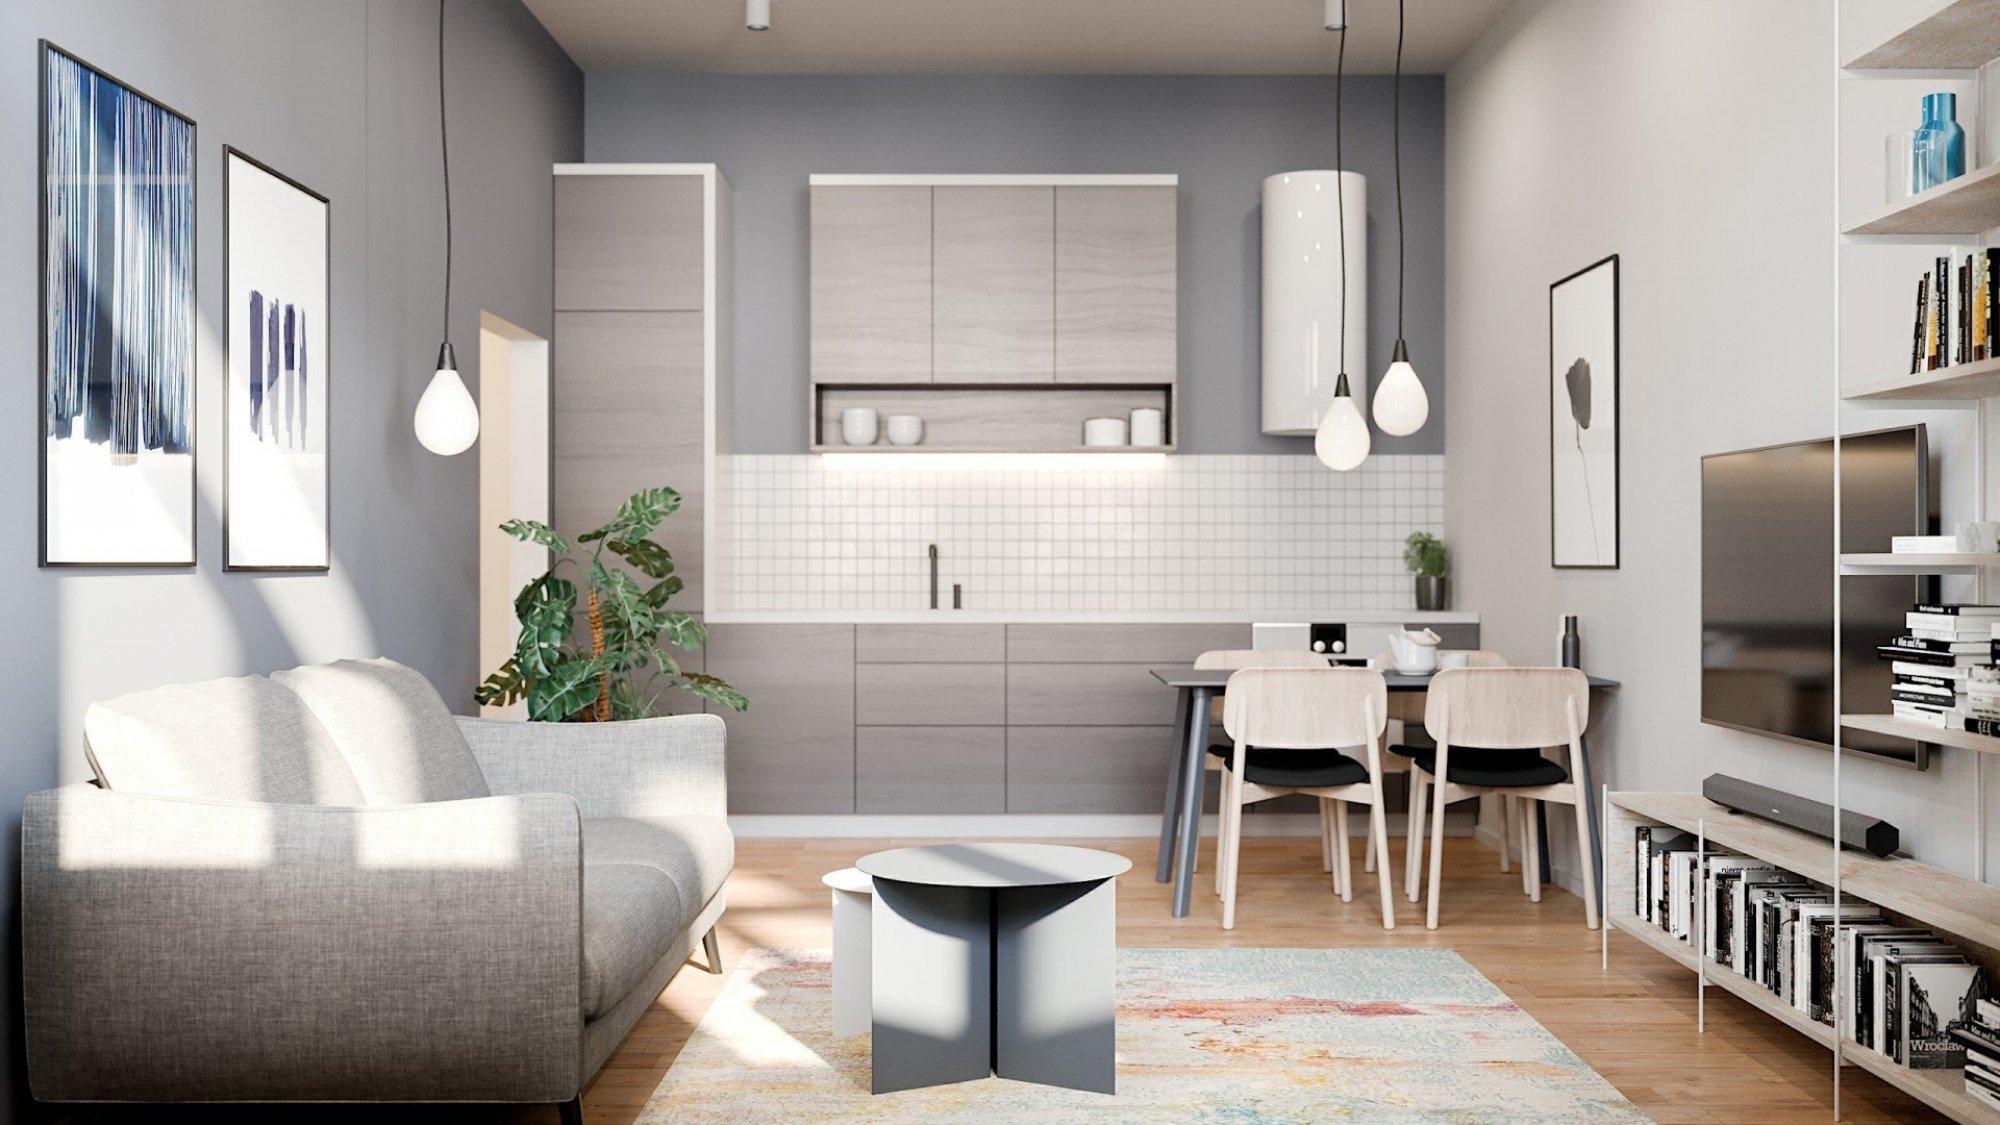 Půdní byt 2+1, plocha 72 m², ulice Bořivojova, Praha 3 - Žižkov, cena 8 450 000 Kč | 2